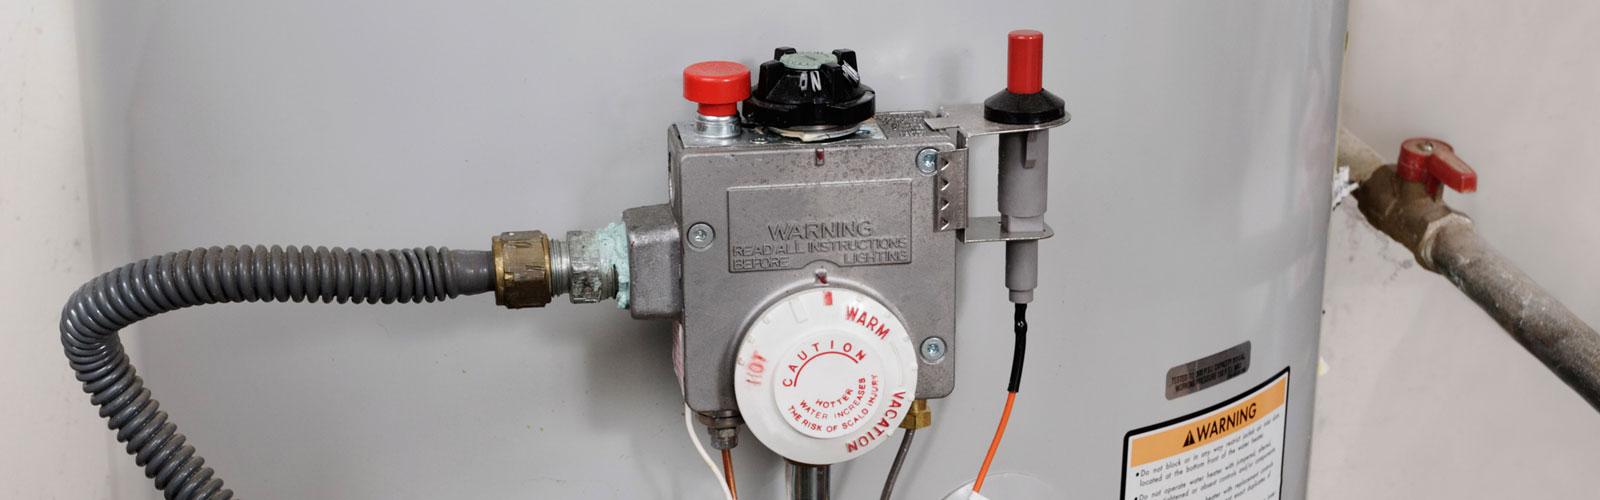 Hot water tank repair & maintenance